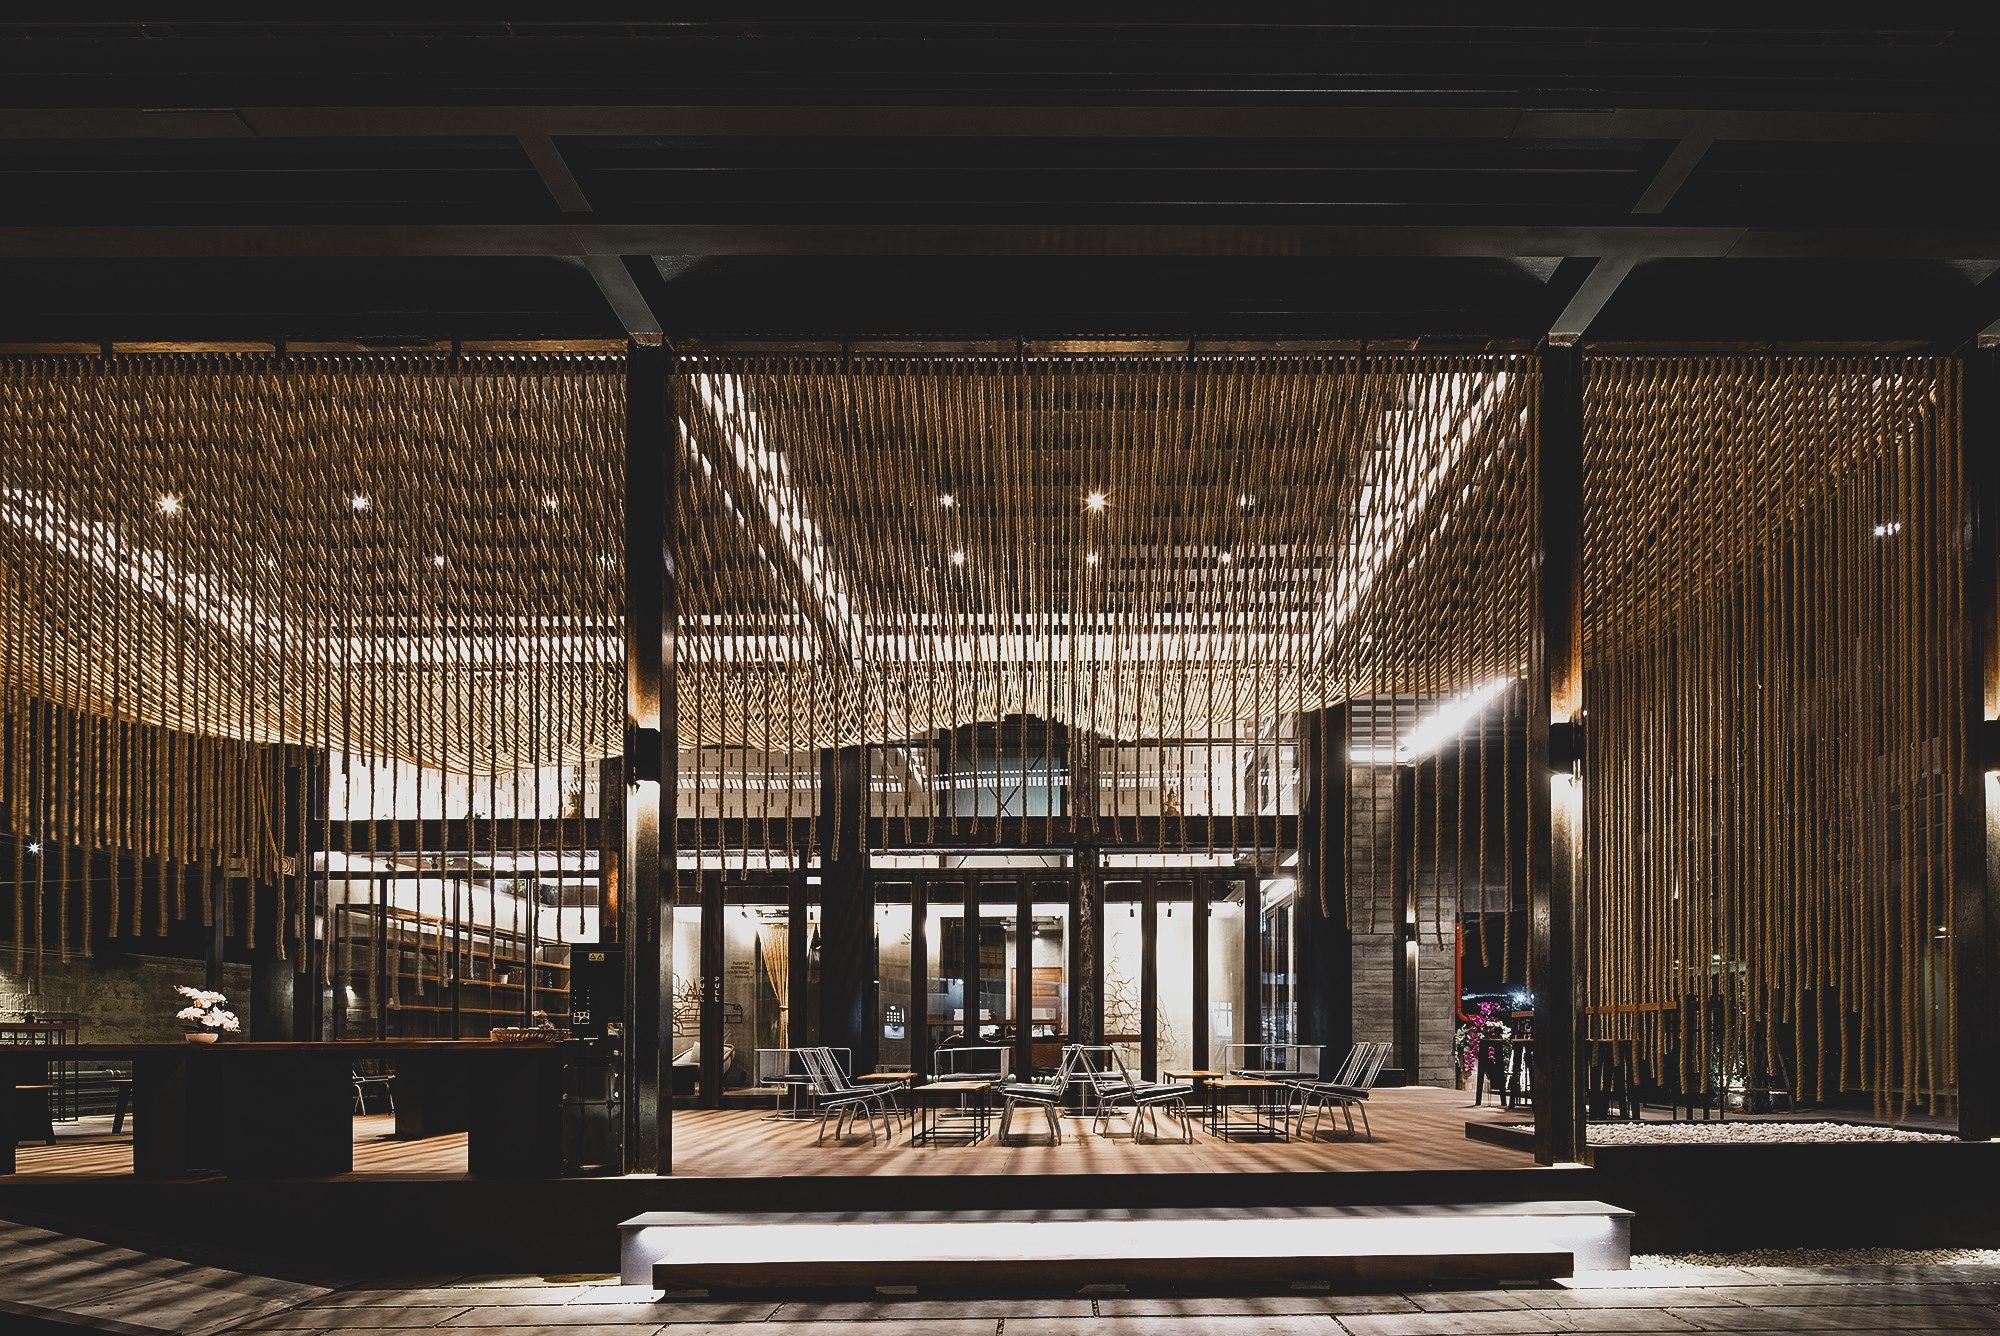 Navakitel Design Model โรงแรมสไตล์มินิมอล นครศรีธรรมราช นครศรีดีย์